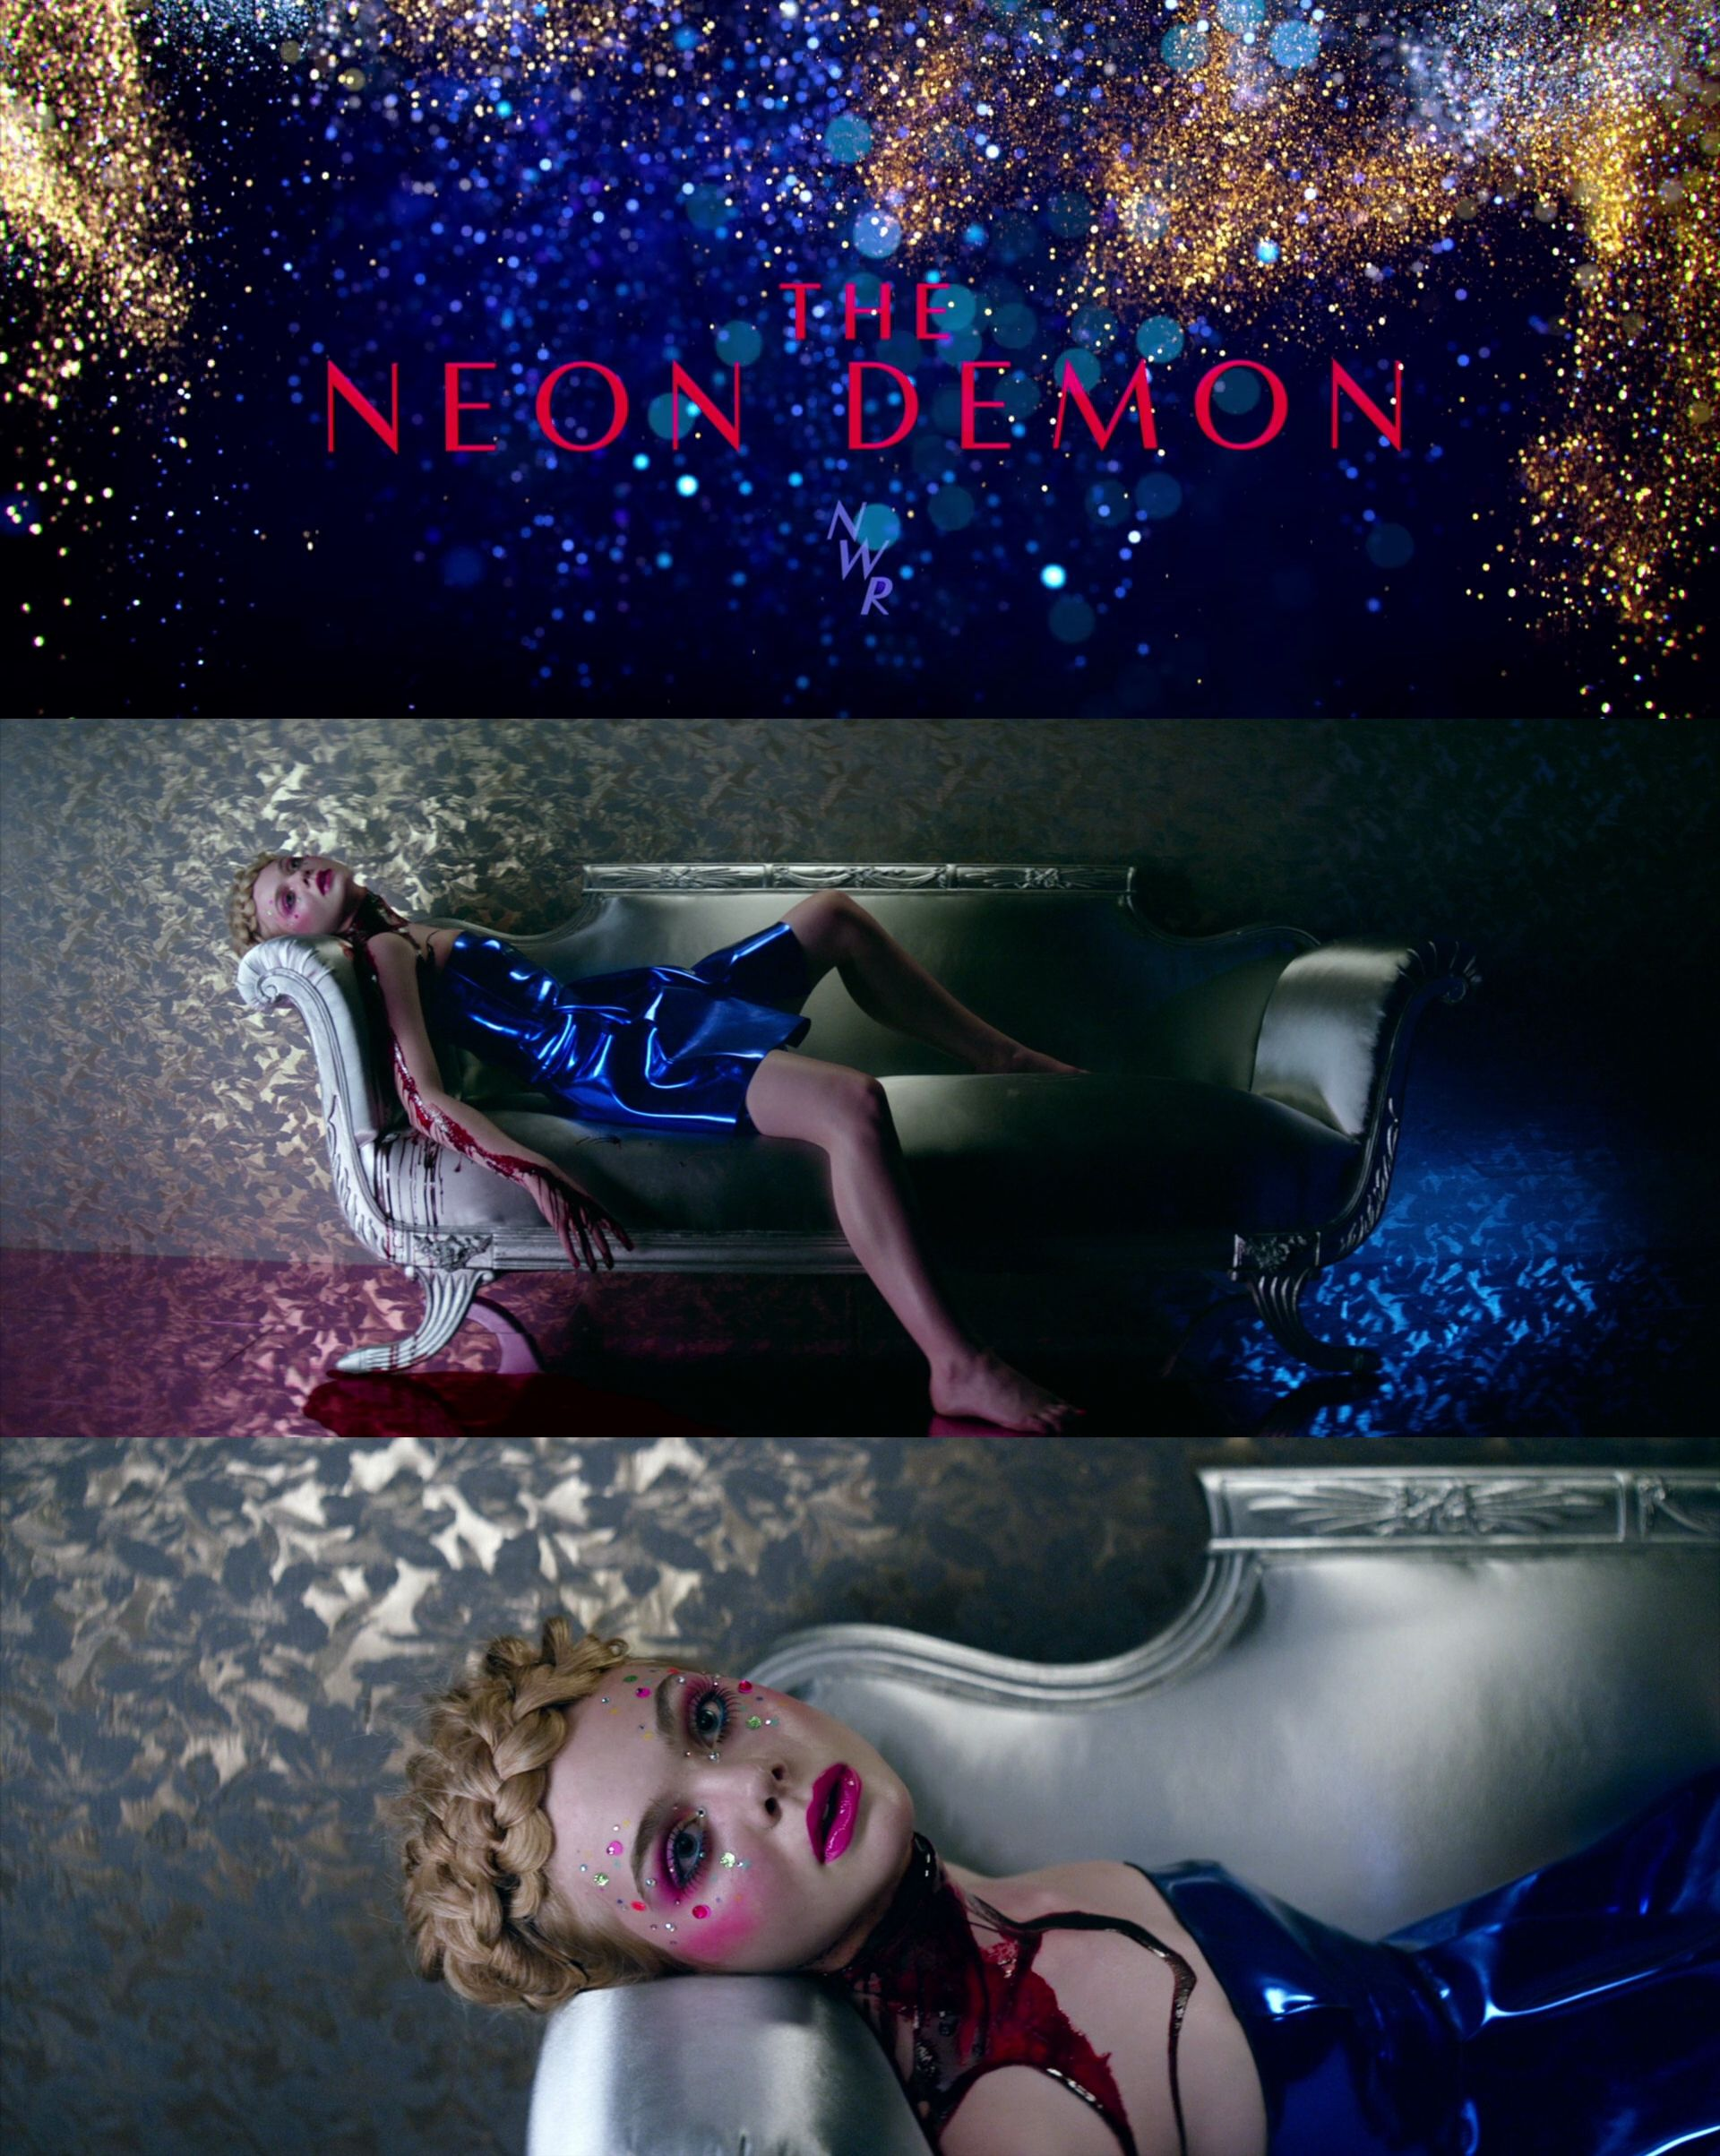 The Neon Demon Nudity